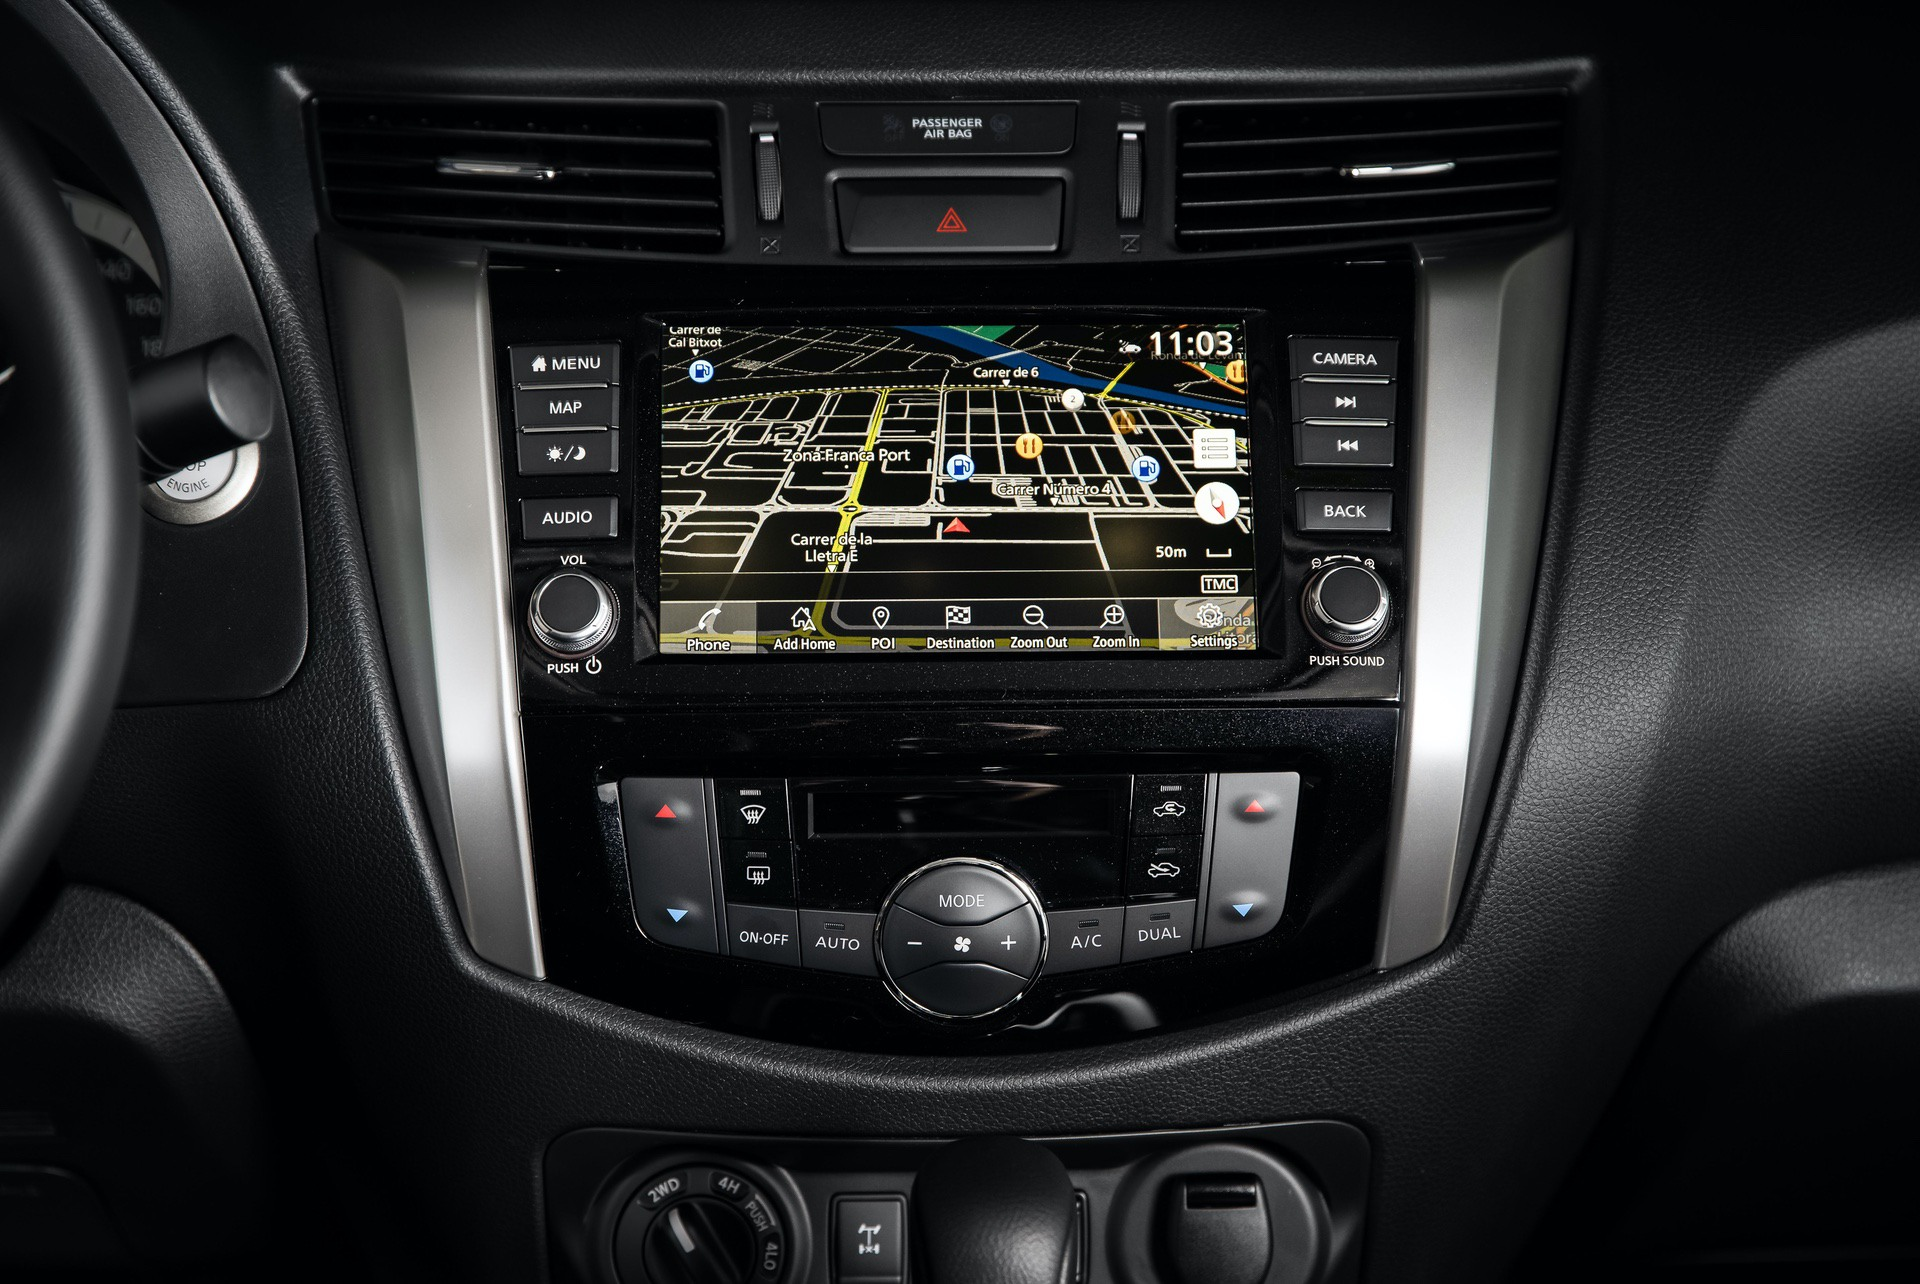 Nissan-Navara-Double-Cab-Interior-4